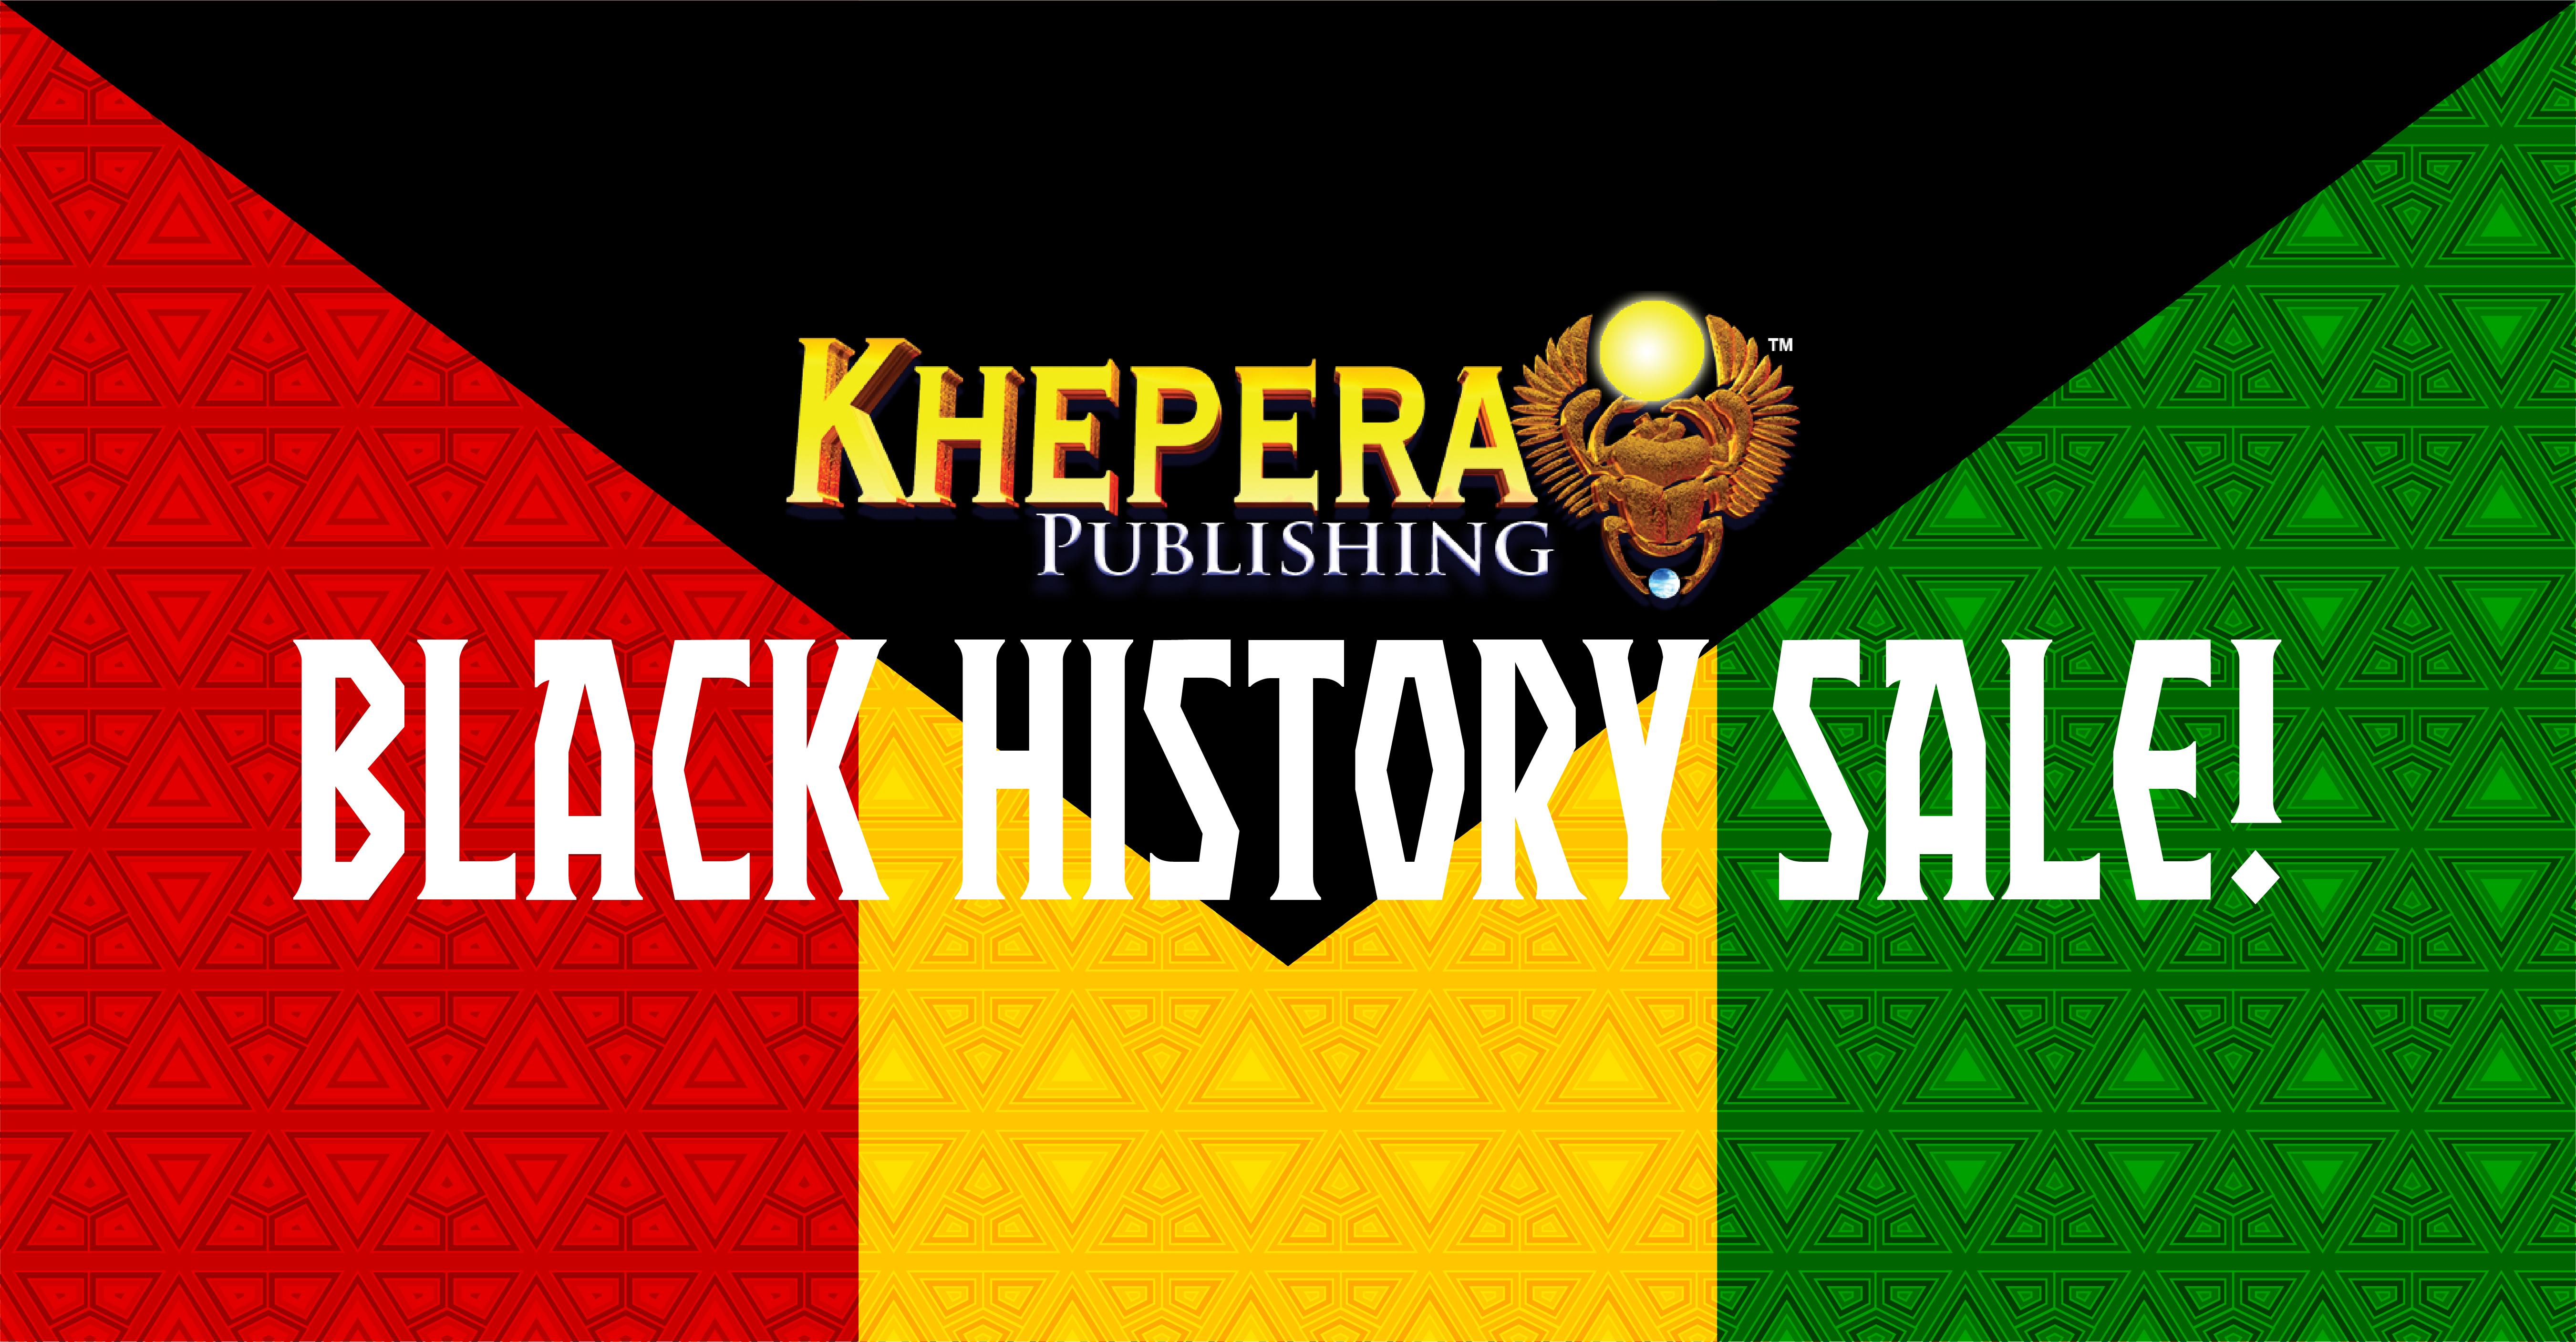 Khepera Publishing Black History Sale!